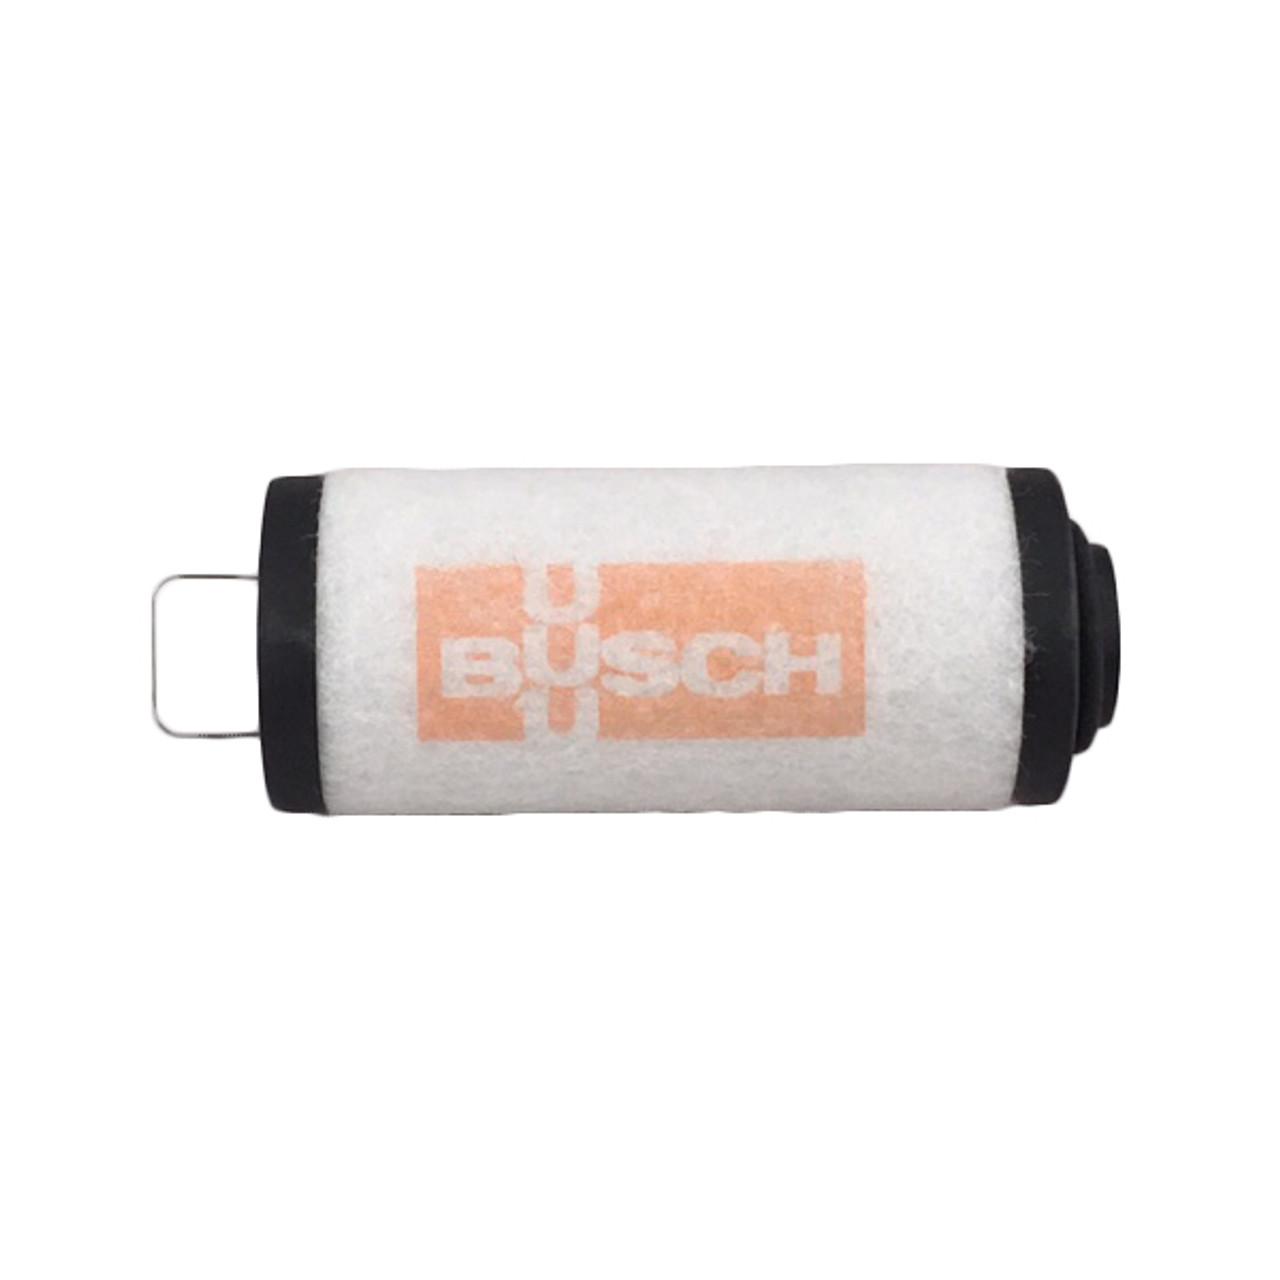 Oil Filter for Vacuum Pump (2k hrs.) (914696)